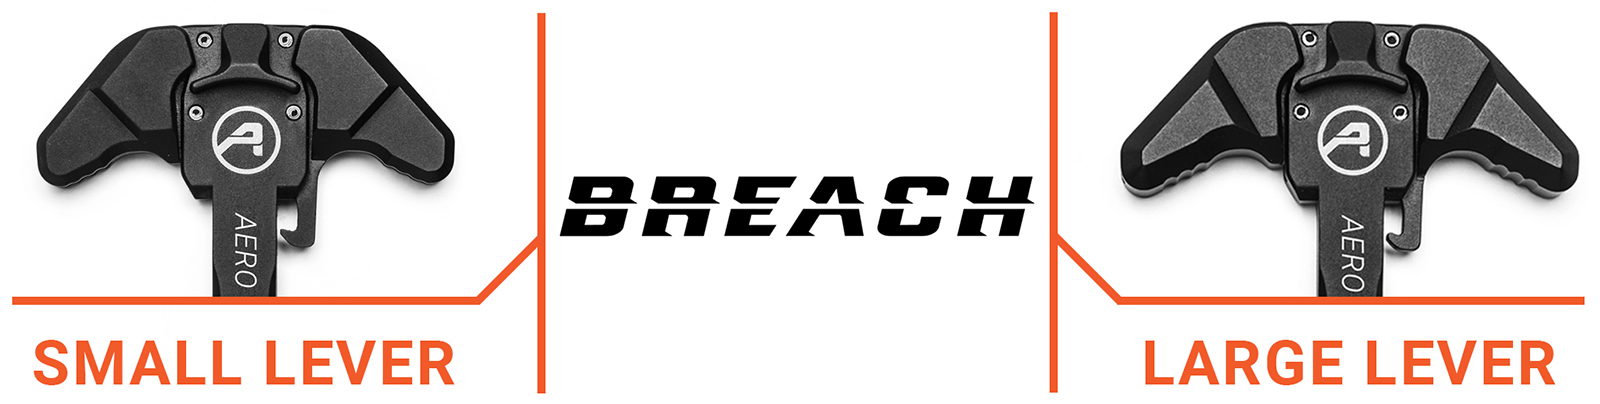 breach-levers.jpg